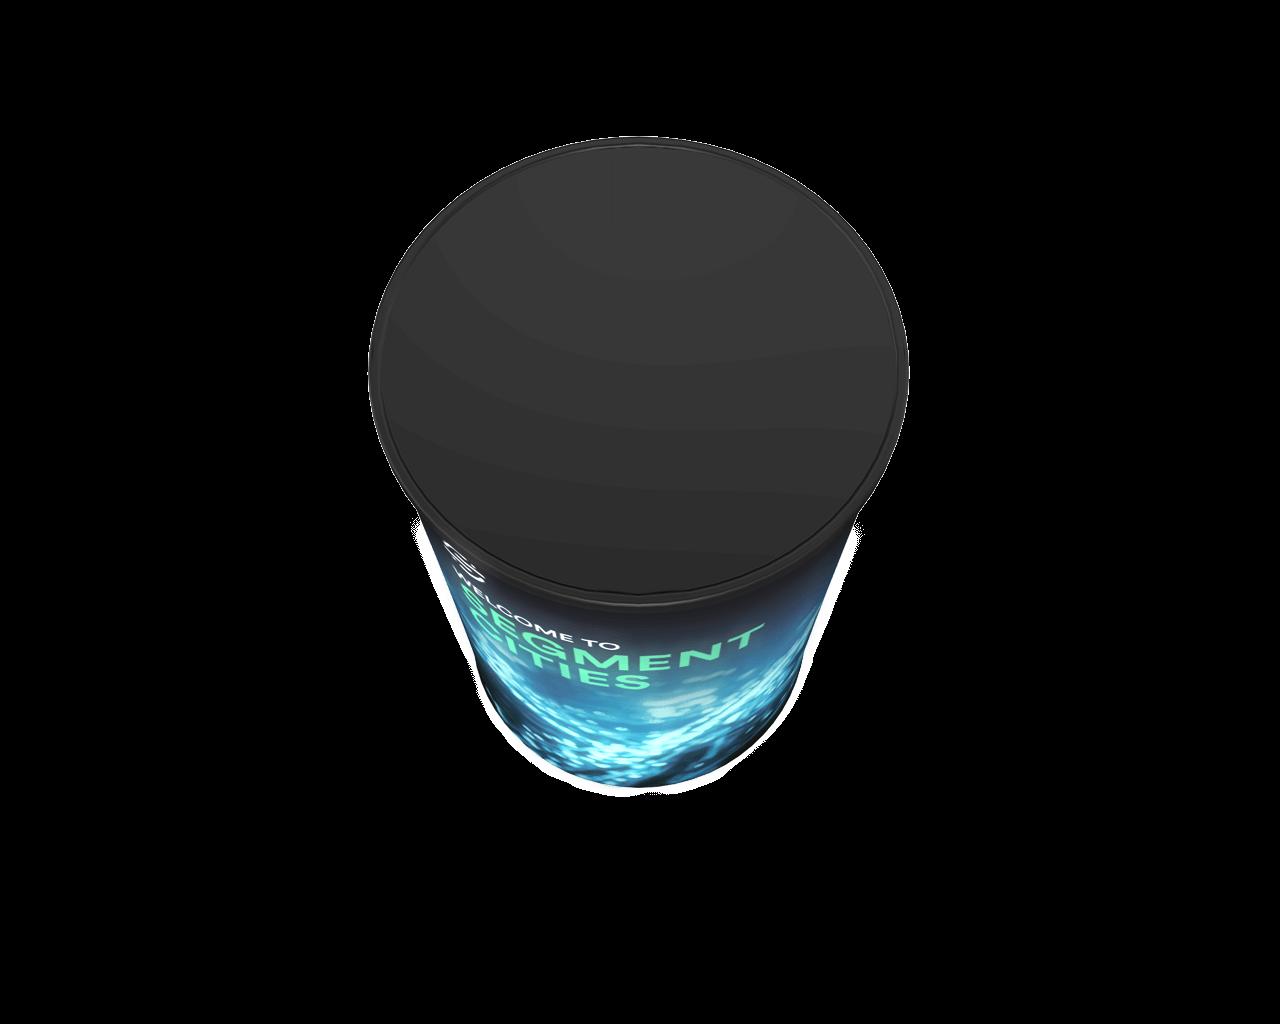 Wavelight Air Backlit Inflatable Counter - Circular